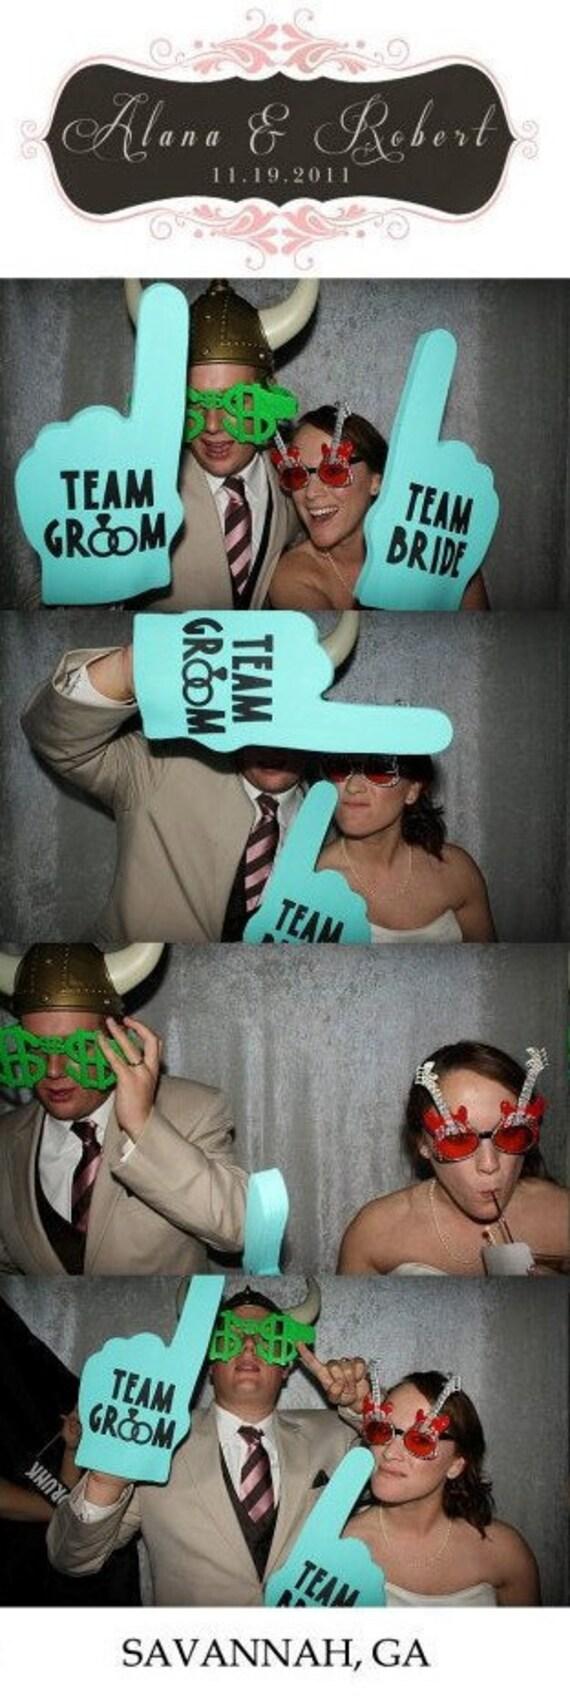 Photobooth Props | Black Team Bride & Team Groom Foam Fingers | Wedding | Bachelorette Party | Bachelor Party | Bridal Shower | Engagement